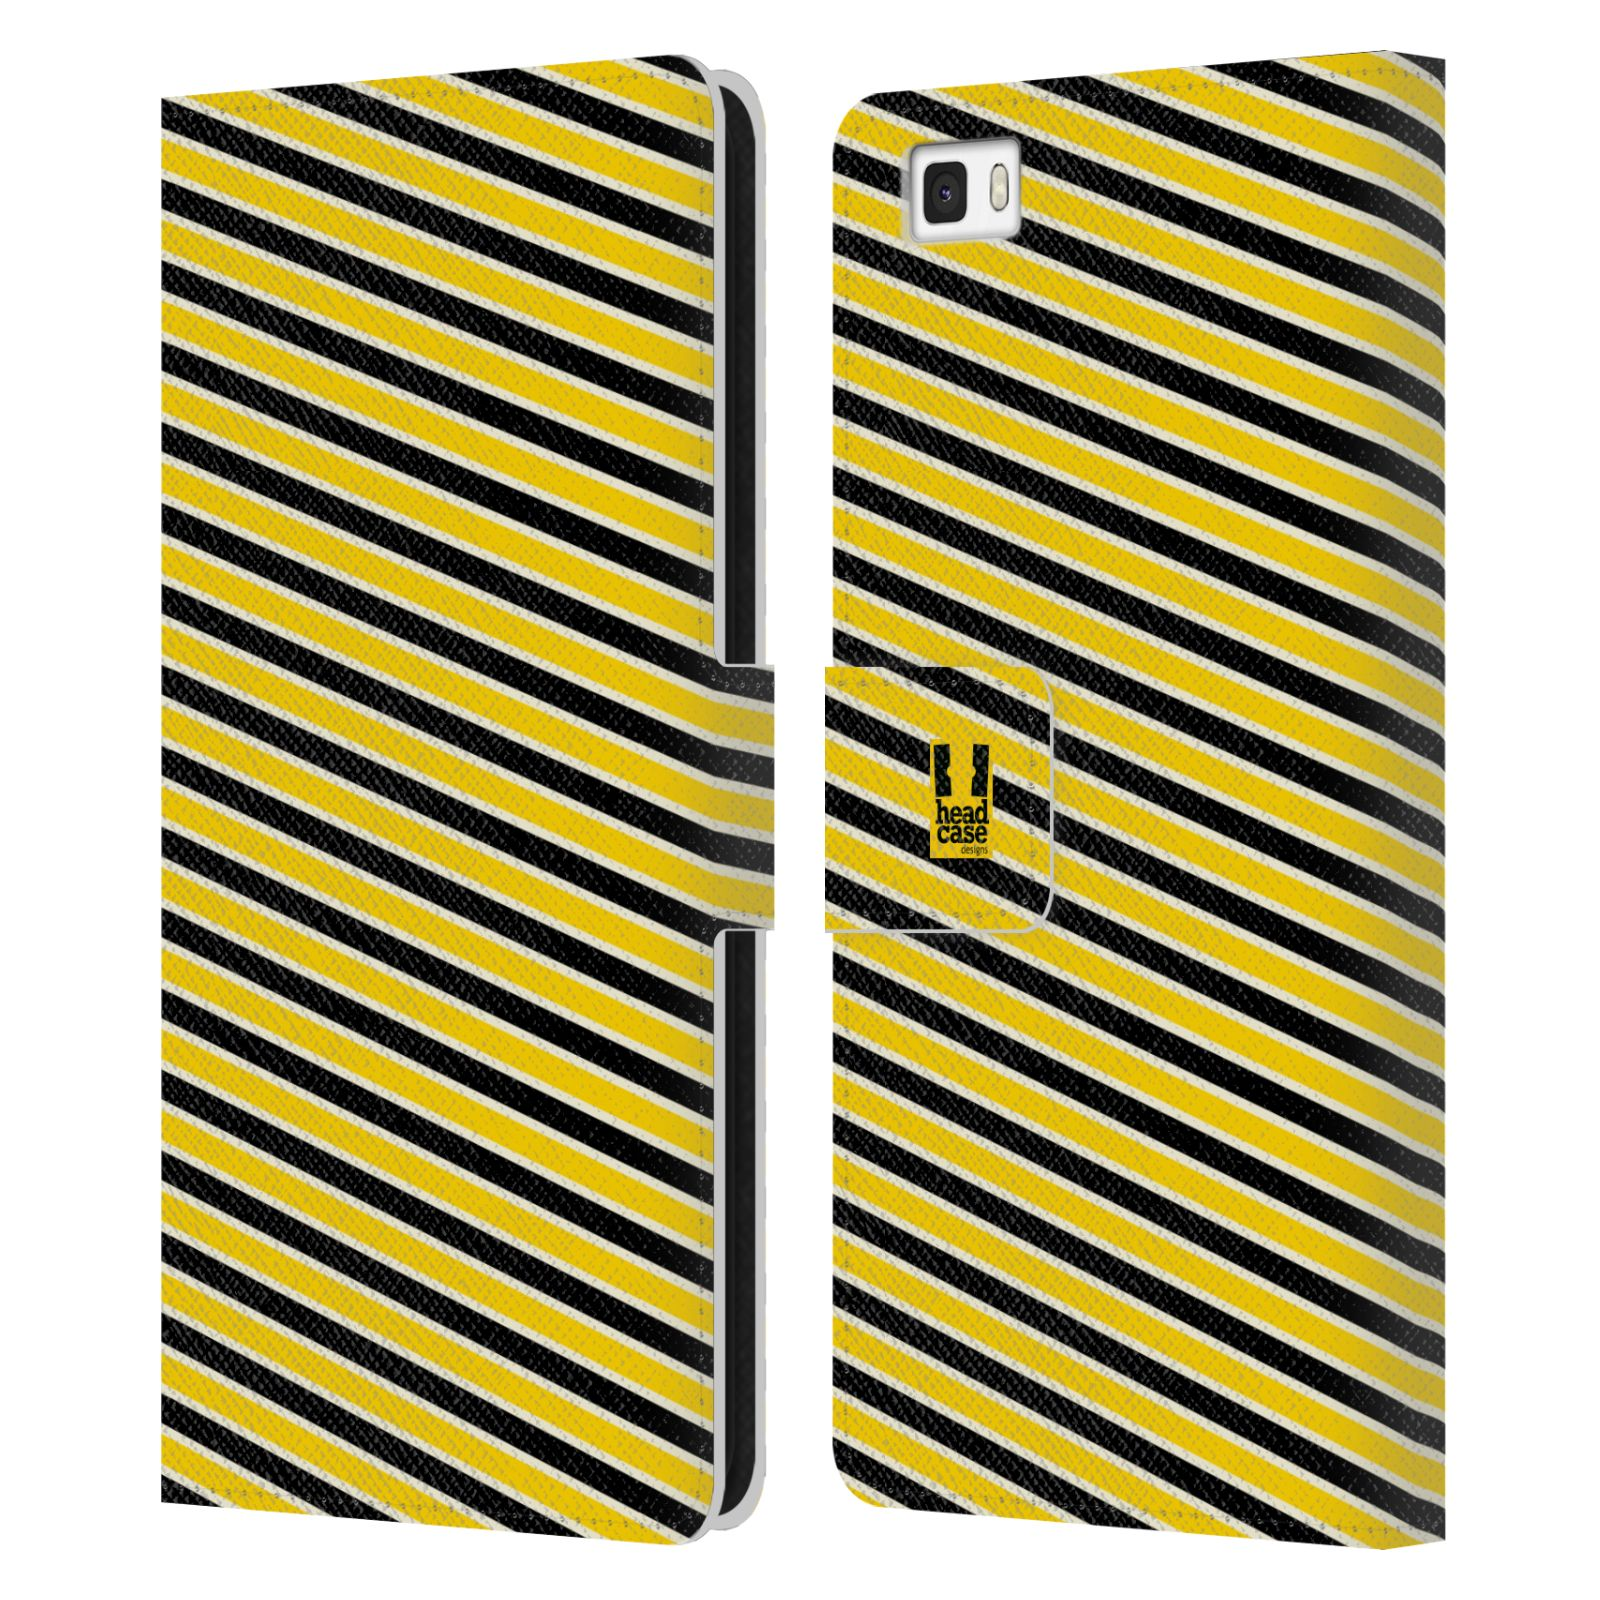 HEAD CASE Flipové pouzdro pro mobil Huawei P8 LITE VČELÍ VZOR pruhy žlutá a černá